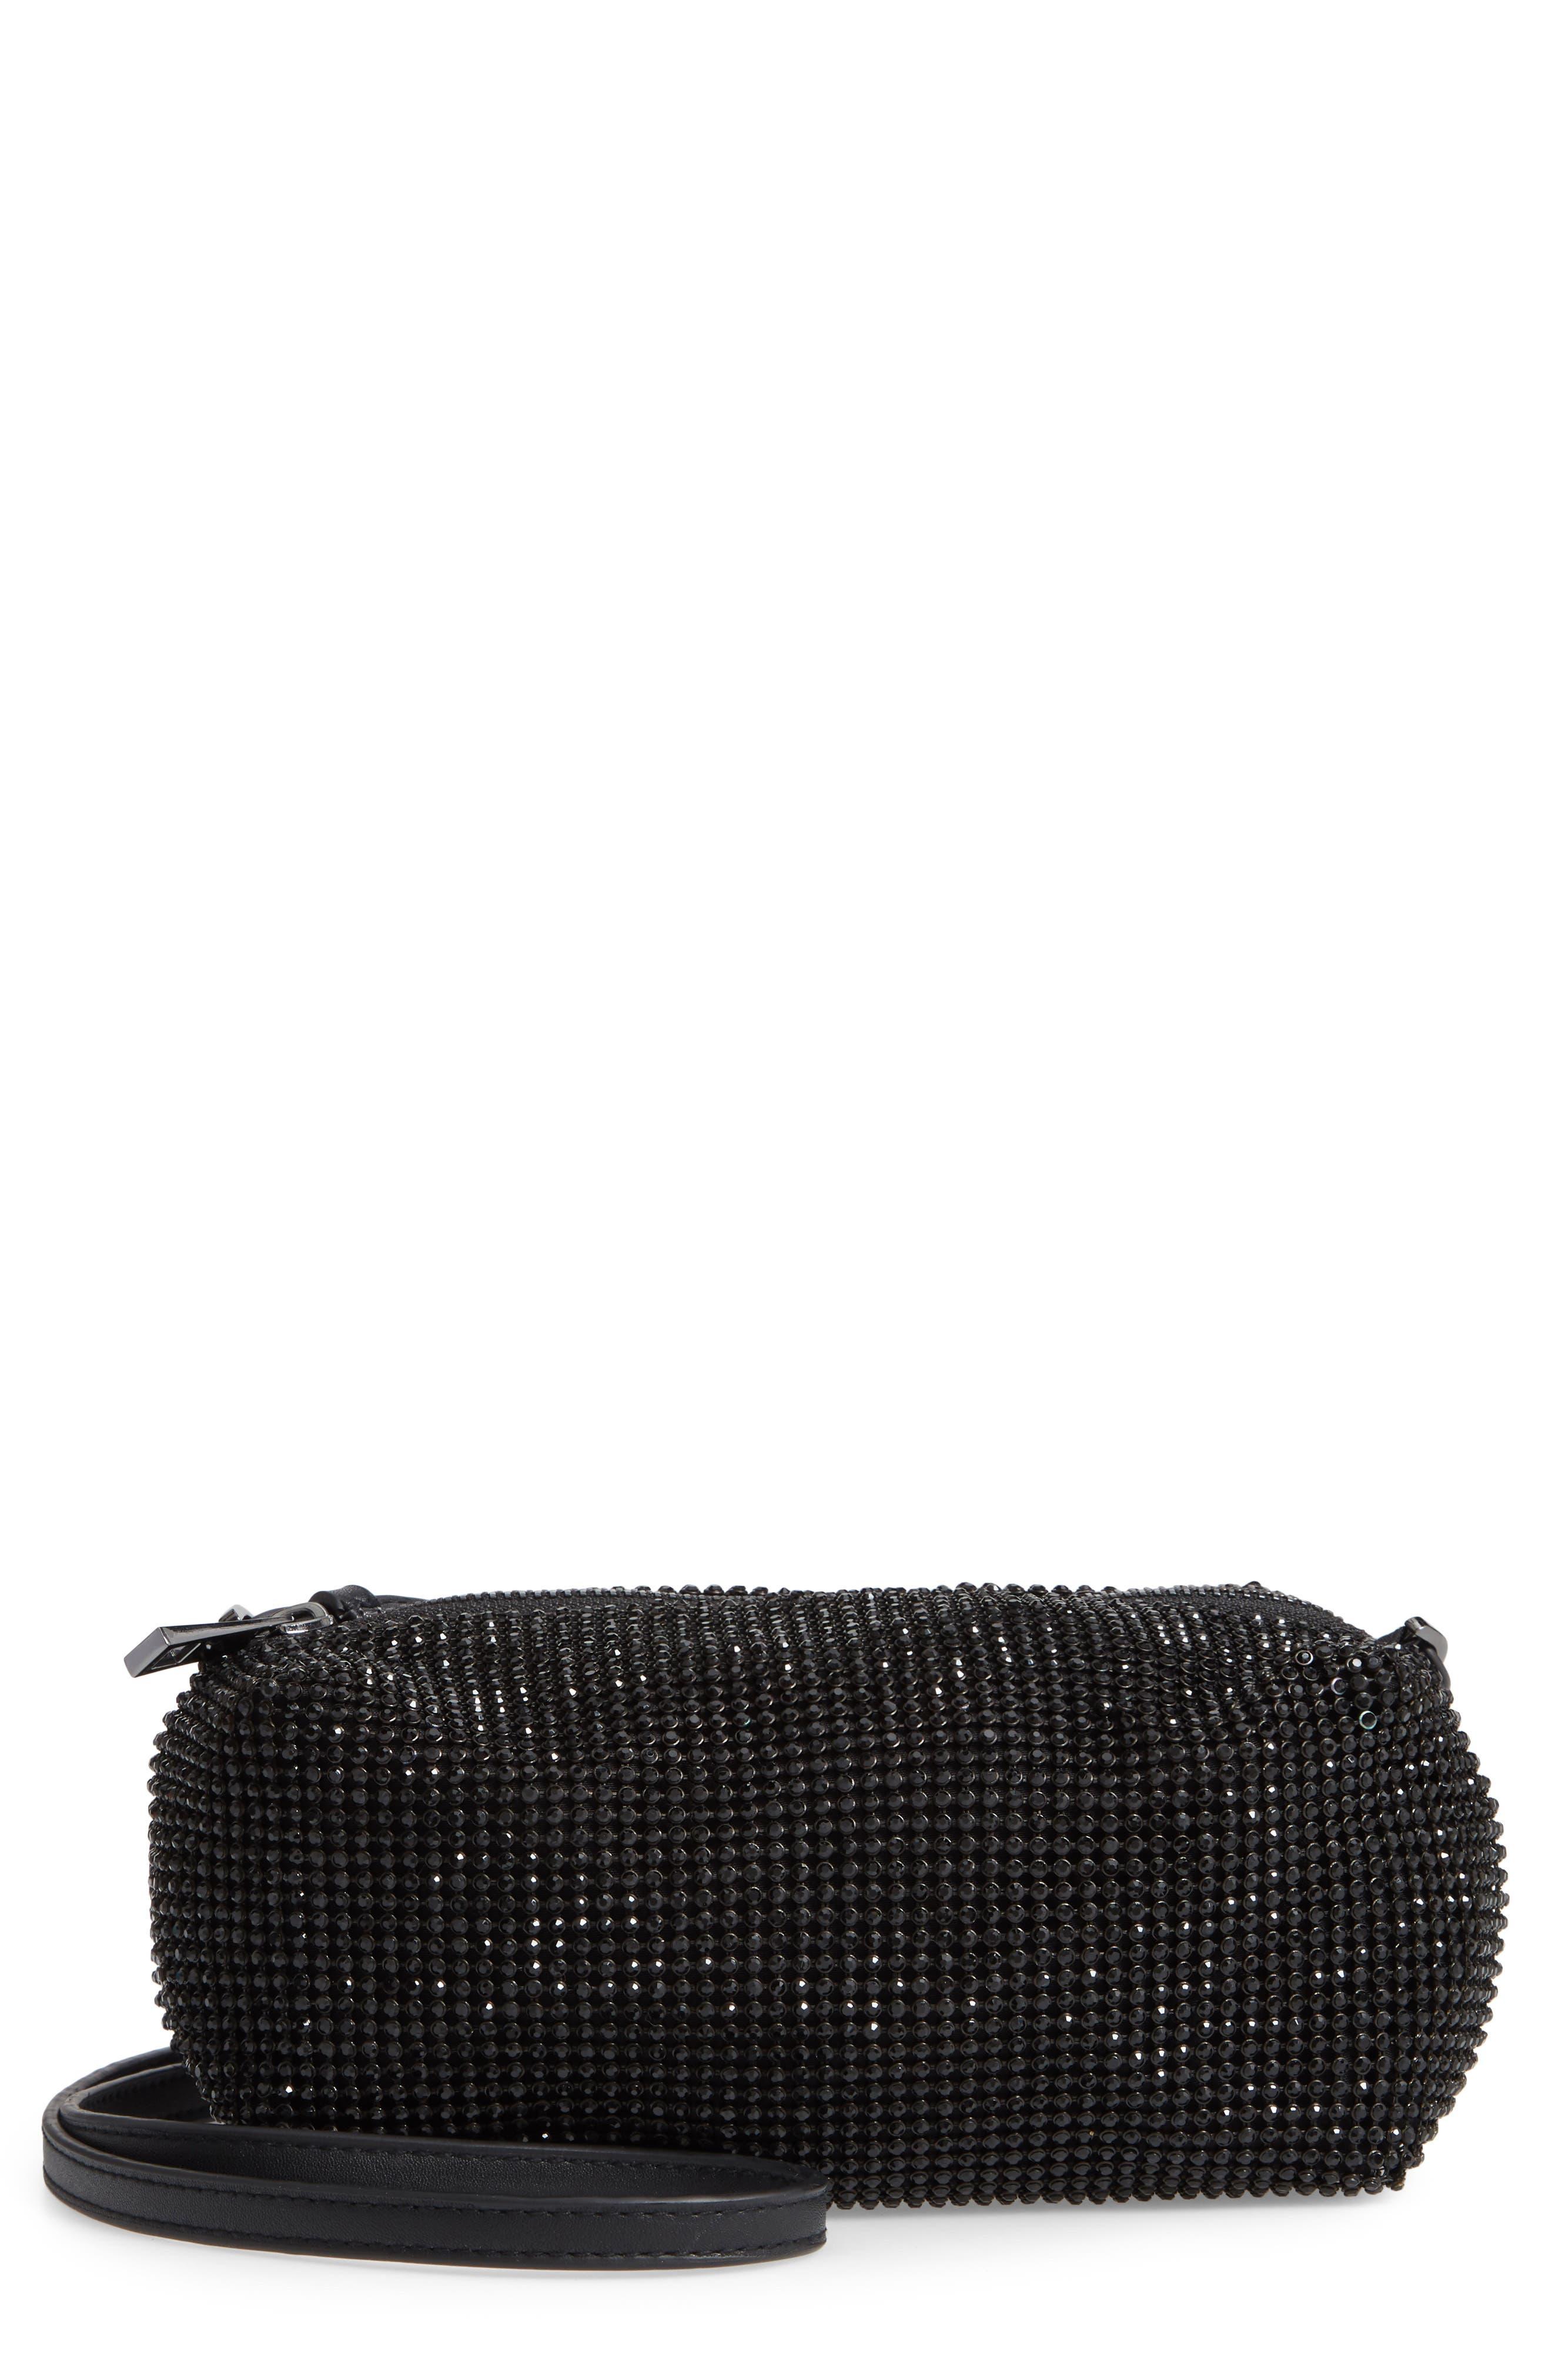 Chia Crystal Embellished Crossbody Bag,                             Main thumbnail 1, color,                             BLACK